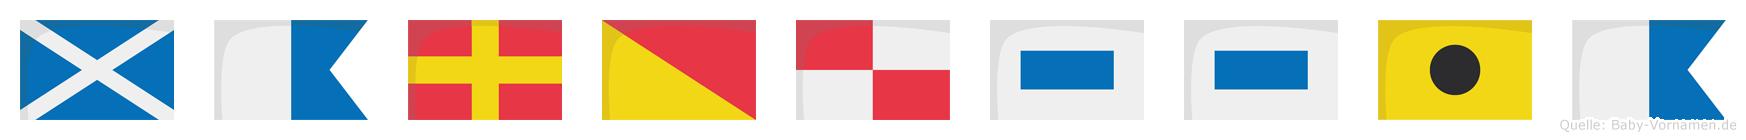 Maroussia im Flaggenalphabet